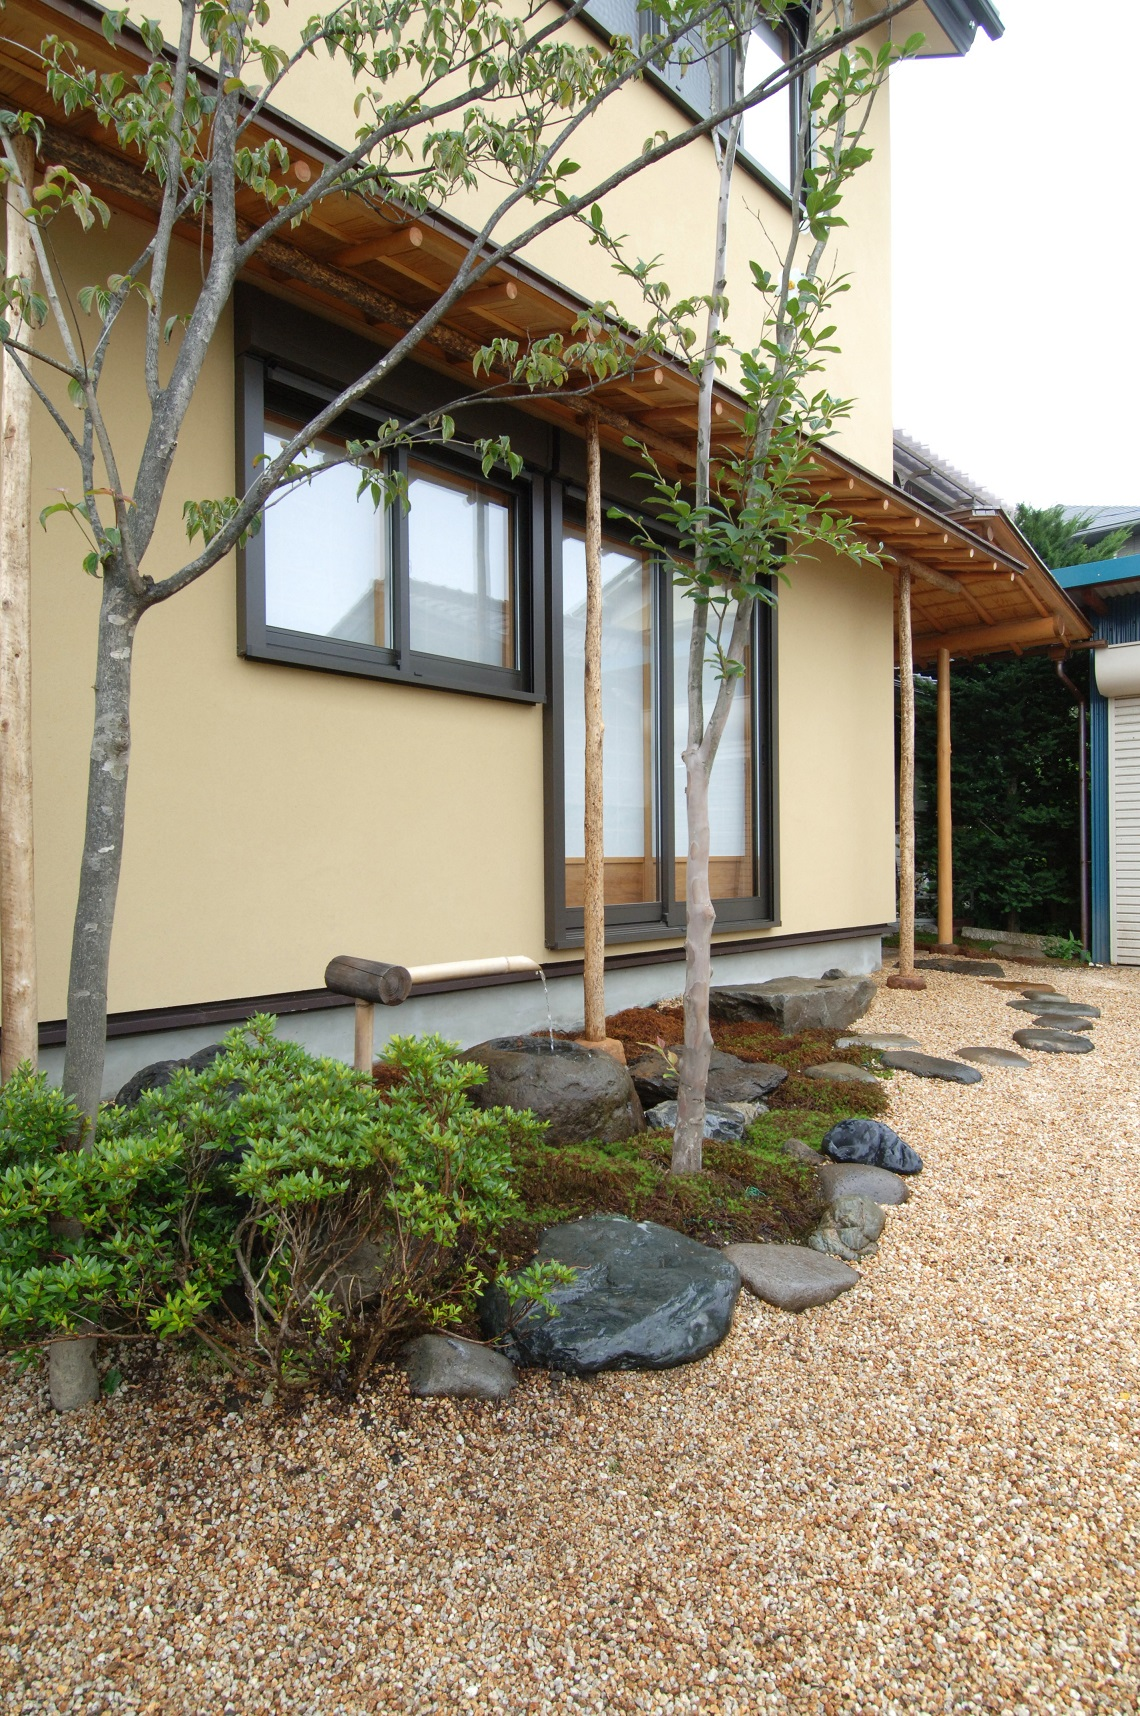 茶室建築の家